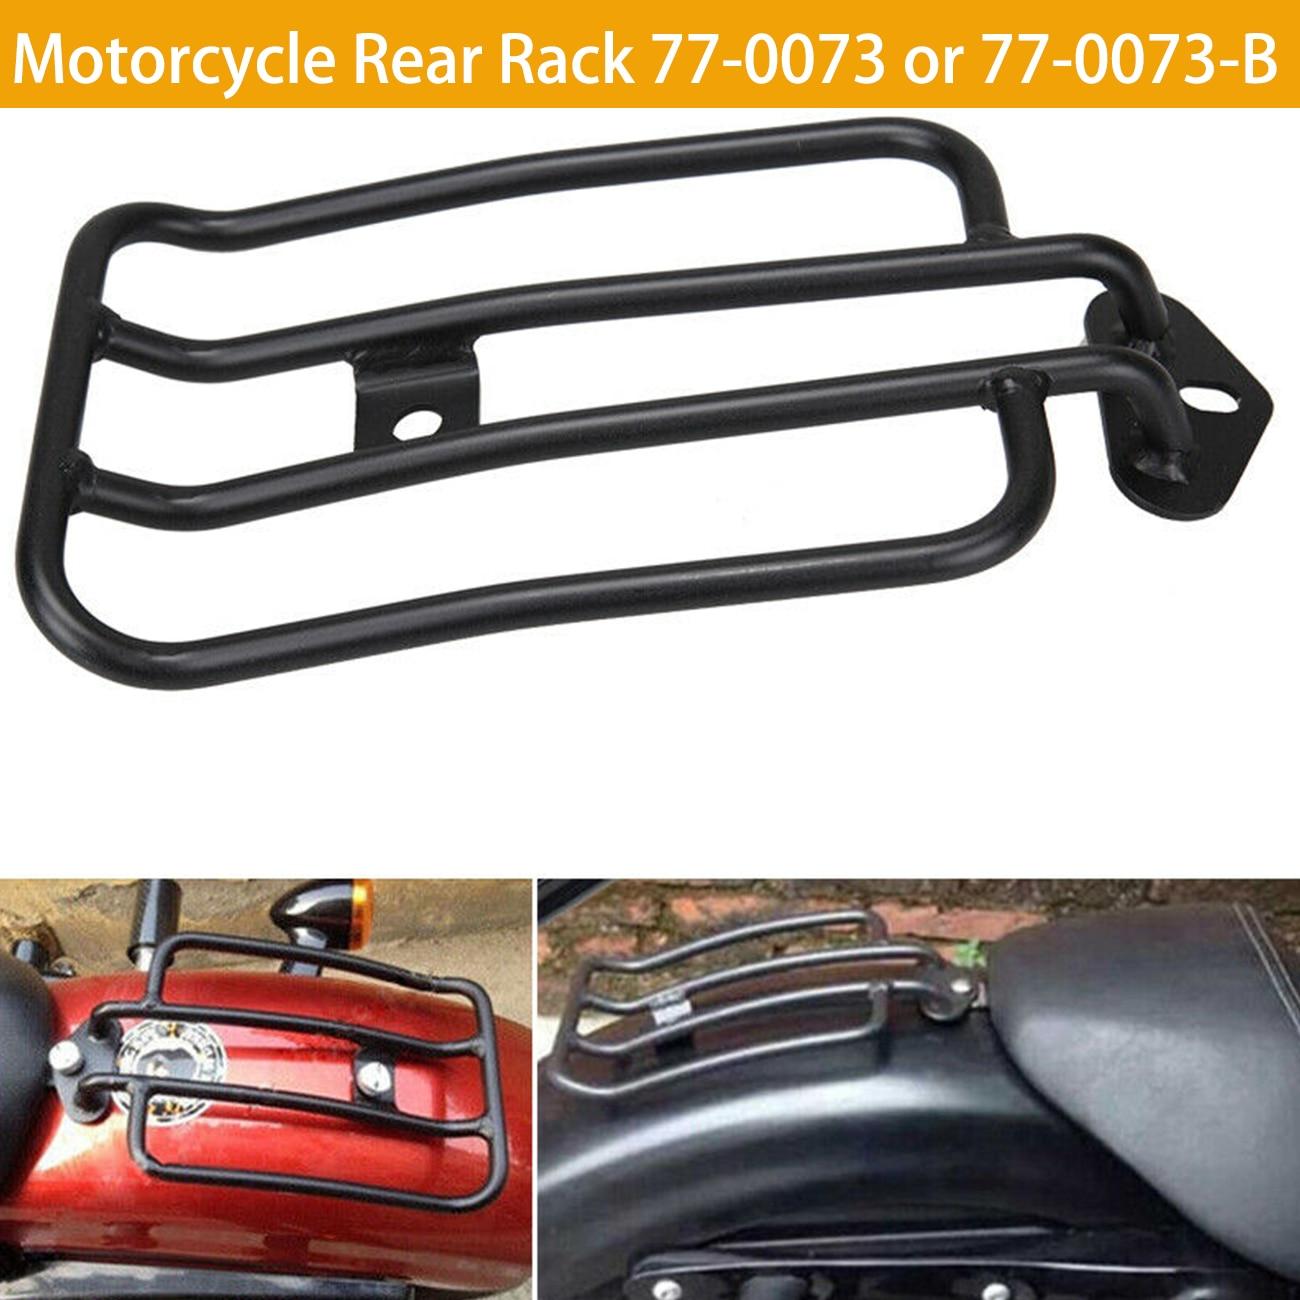 For Harley Sportster Iron 48 883 XL1200 2004-2018 2015 2016 2017 Sissy Bar Backrest Luggage Solo Shelf Frame Rack